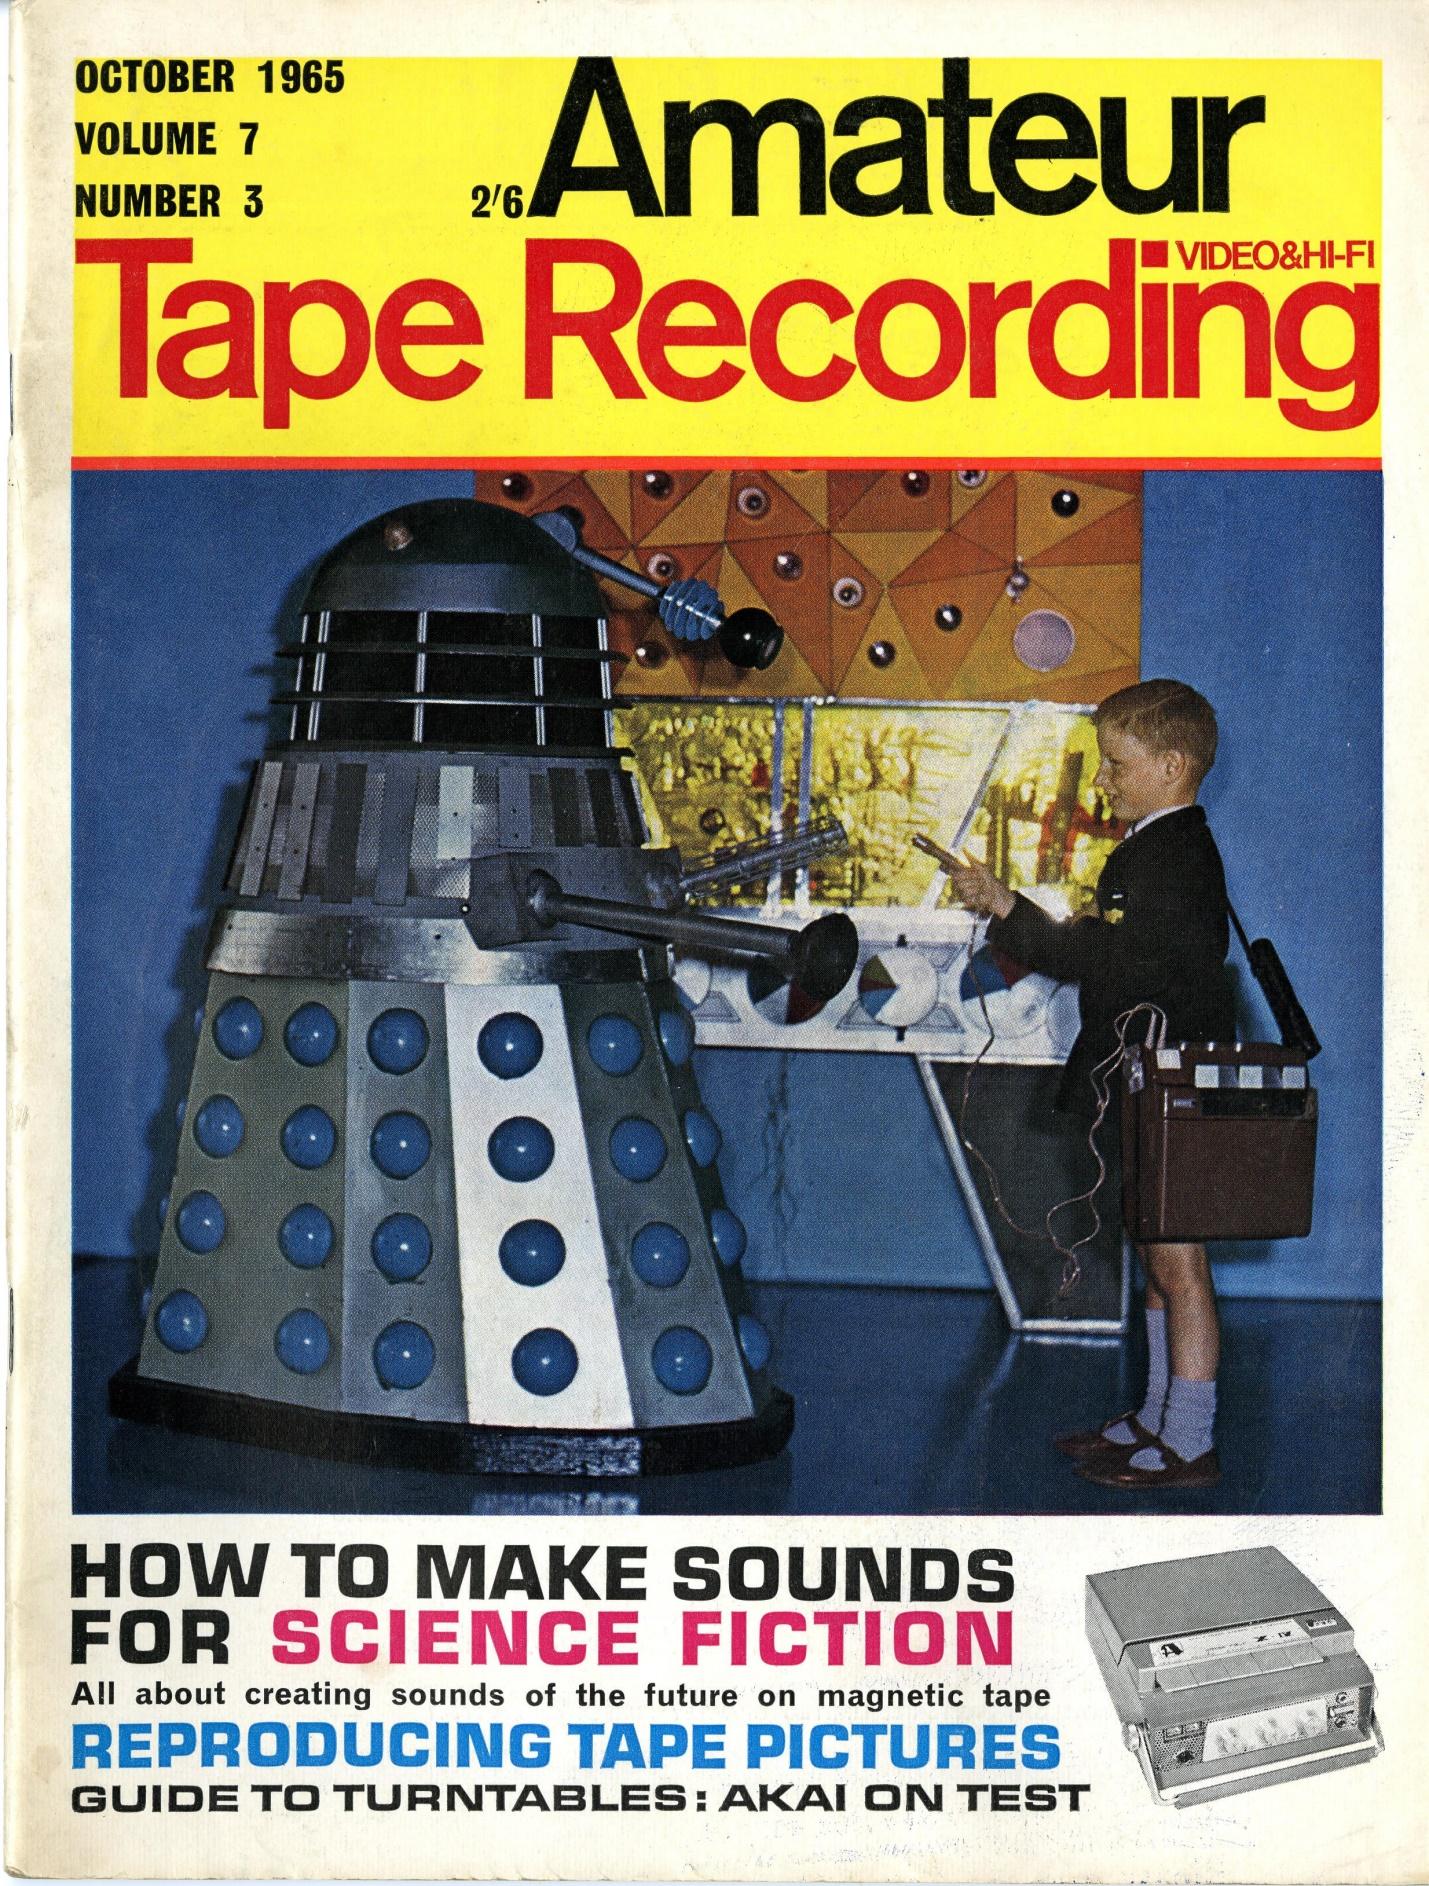 Amateur Tape Recording, October 1965